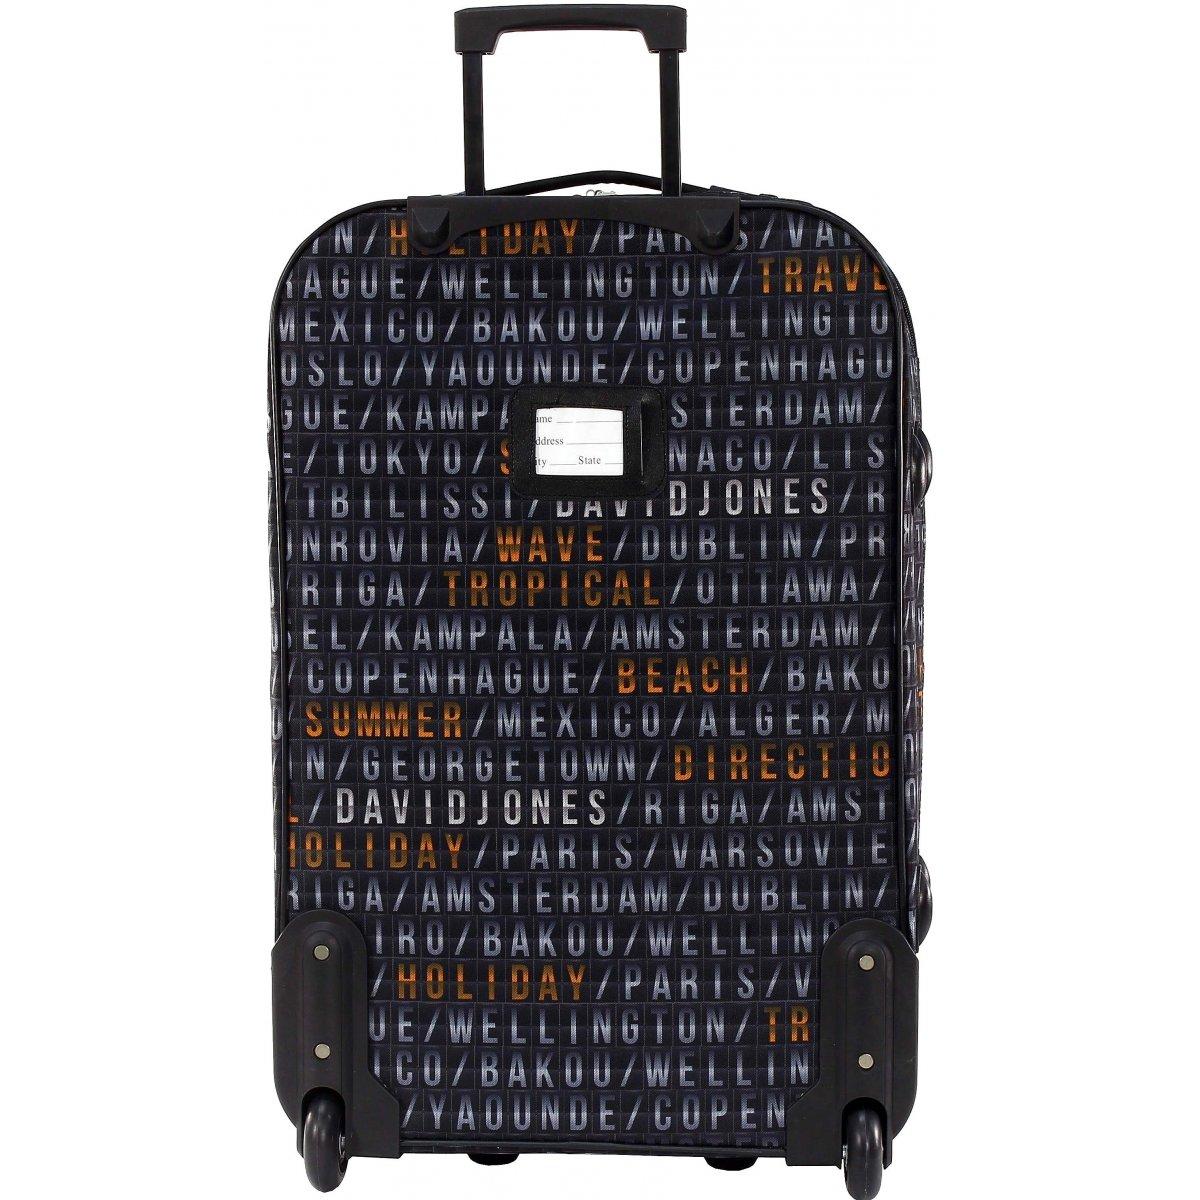 lot 3 valises dont 1 cabine ryanair david jones ba10023 couleur principale affichage. Black Bedroom Furniture Sets. Home Design Ideas